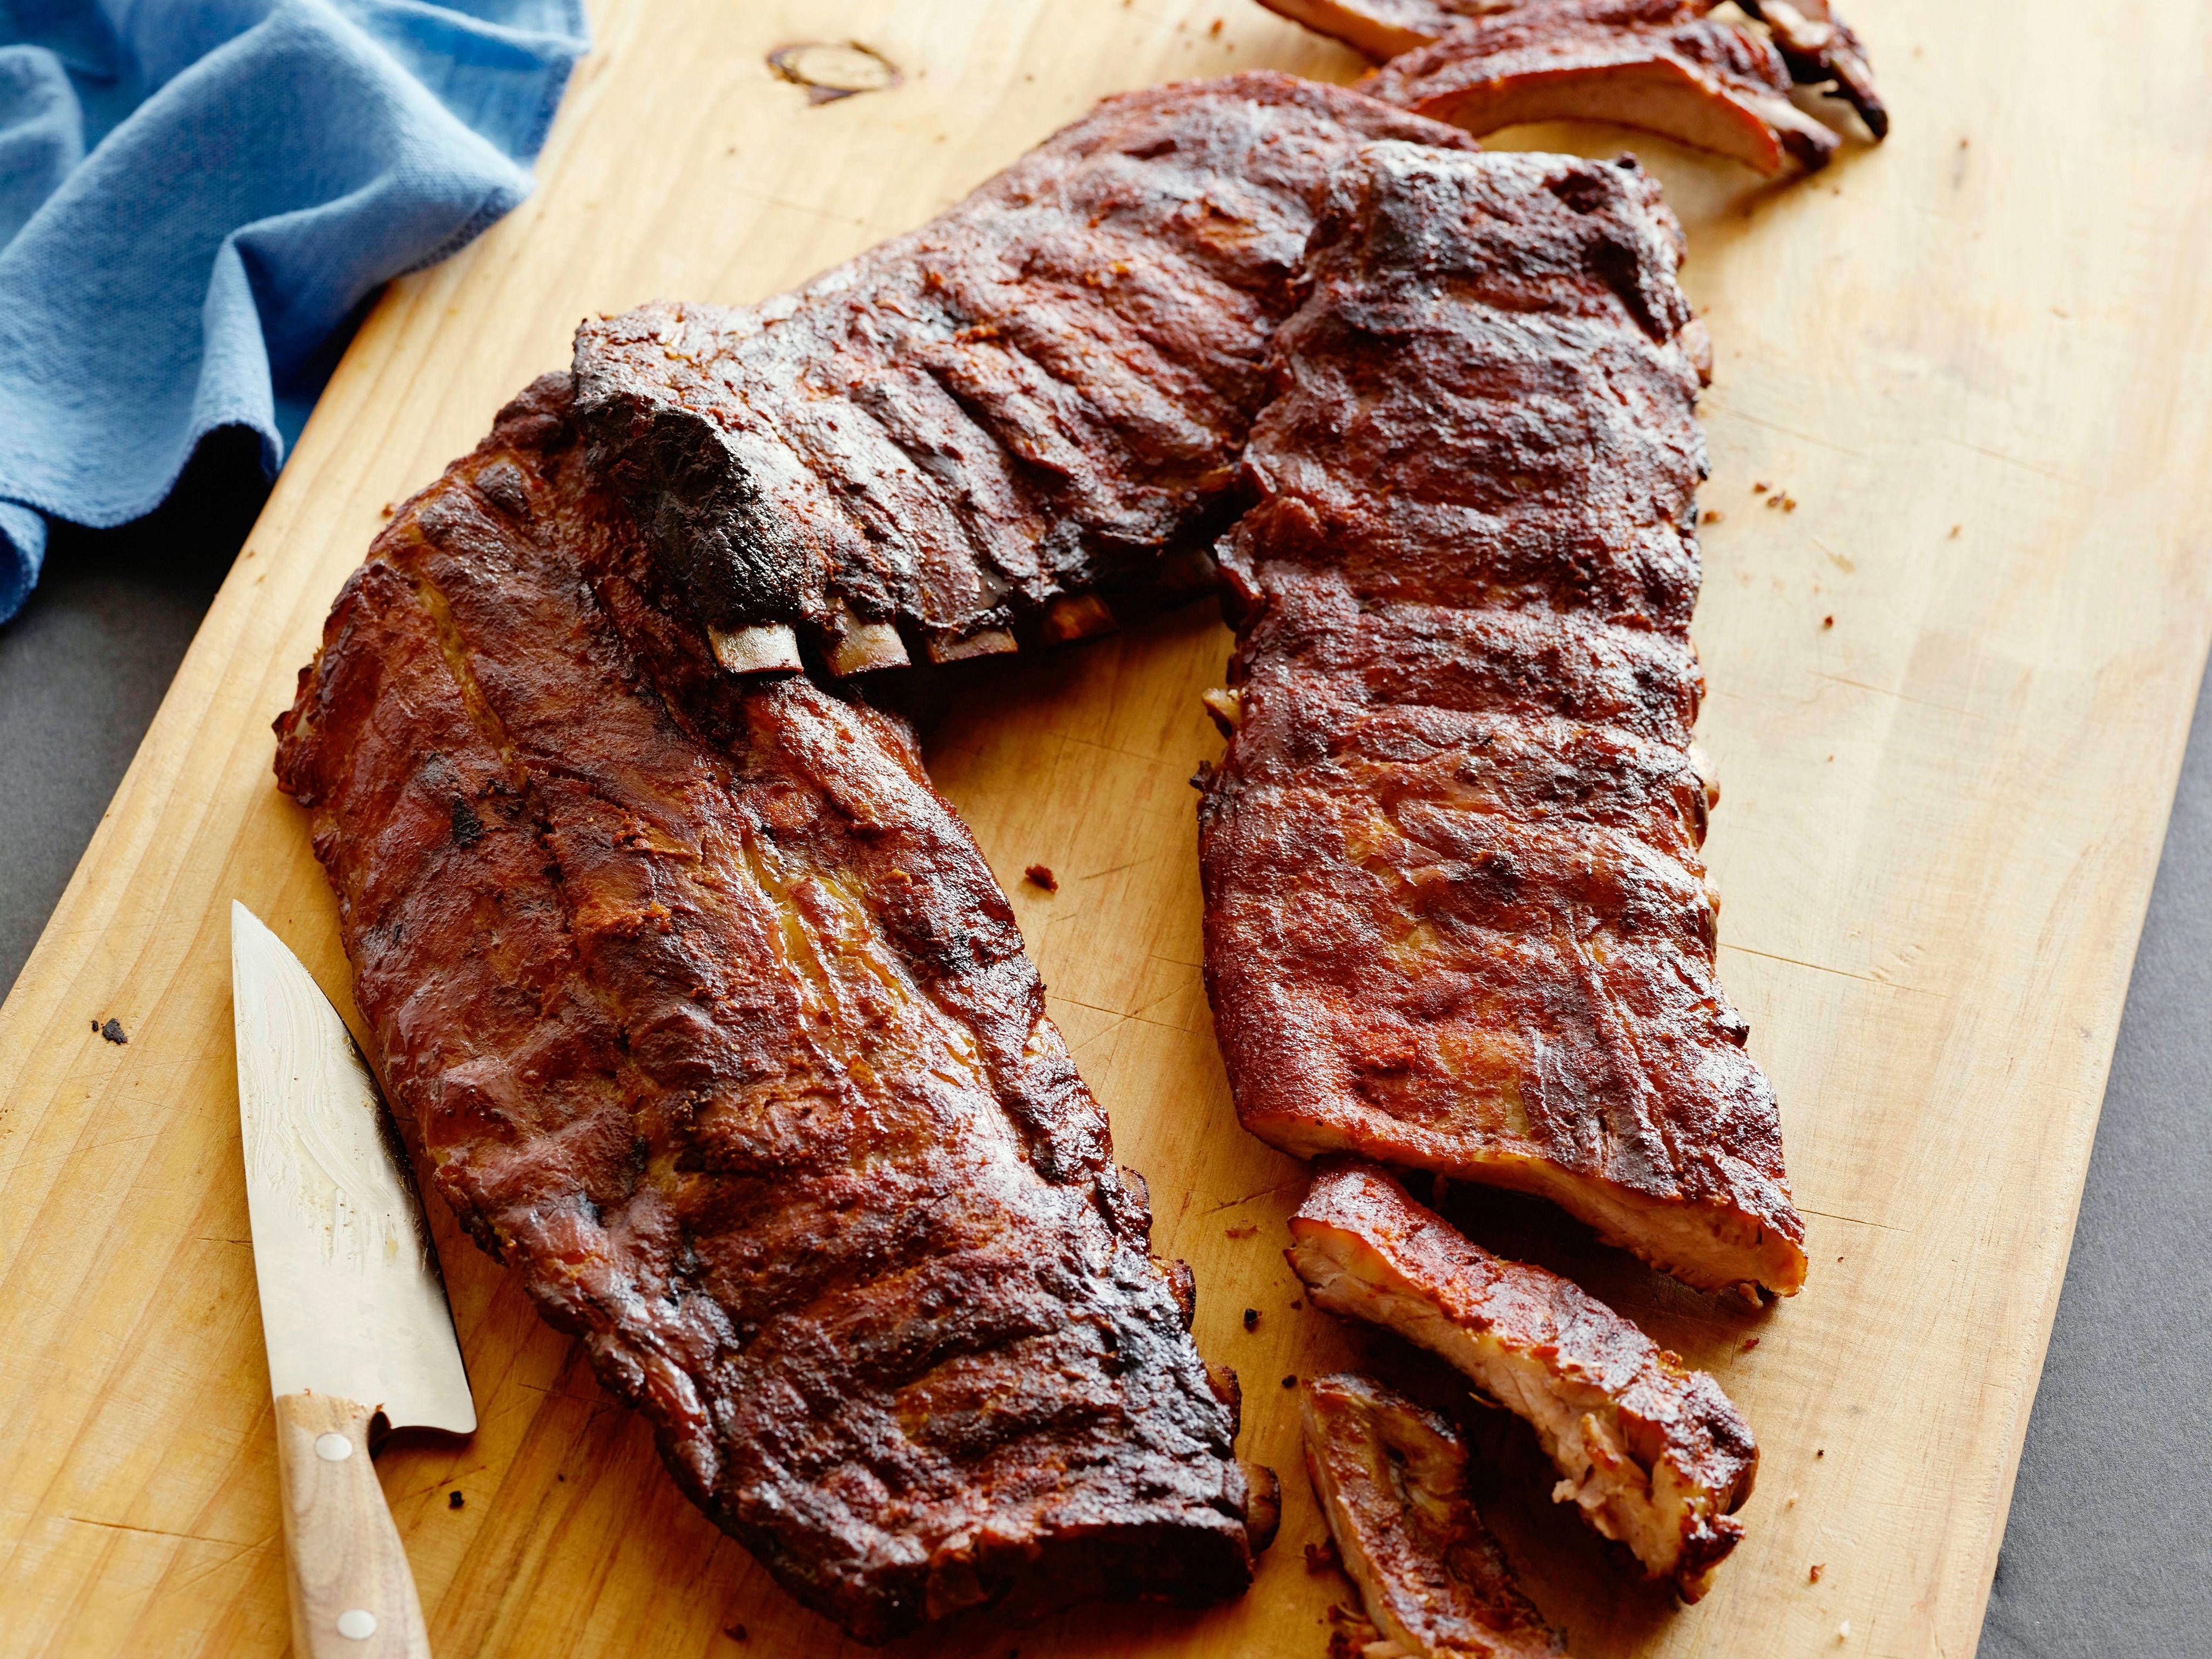 Barbecue St Louis Pork Ribs Recipe Rib Recipes Pork Ribs Bbq Recipes Ribs